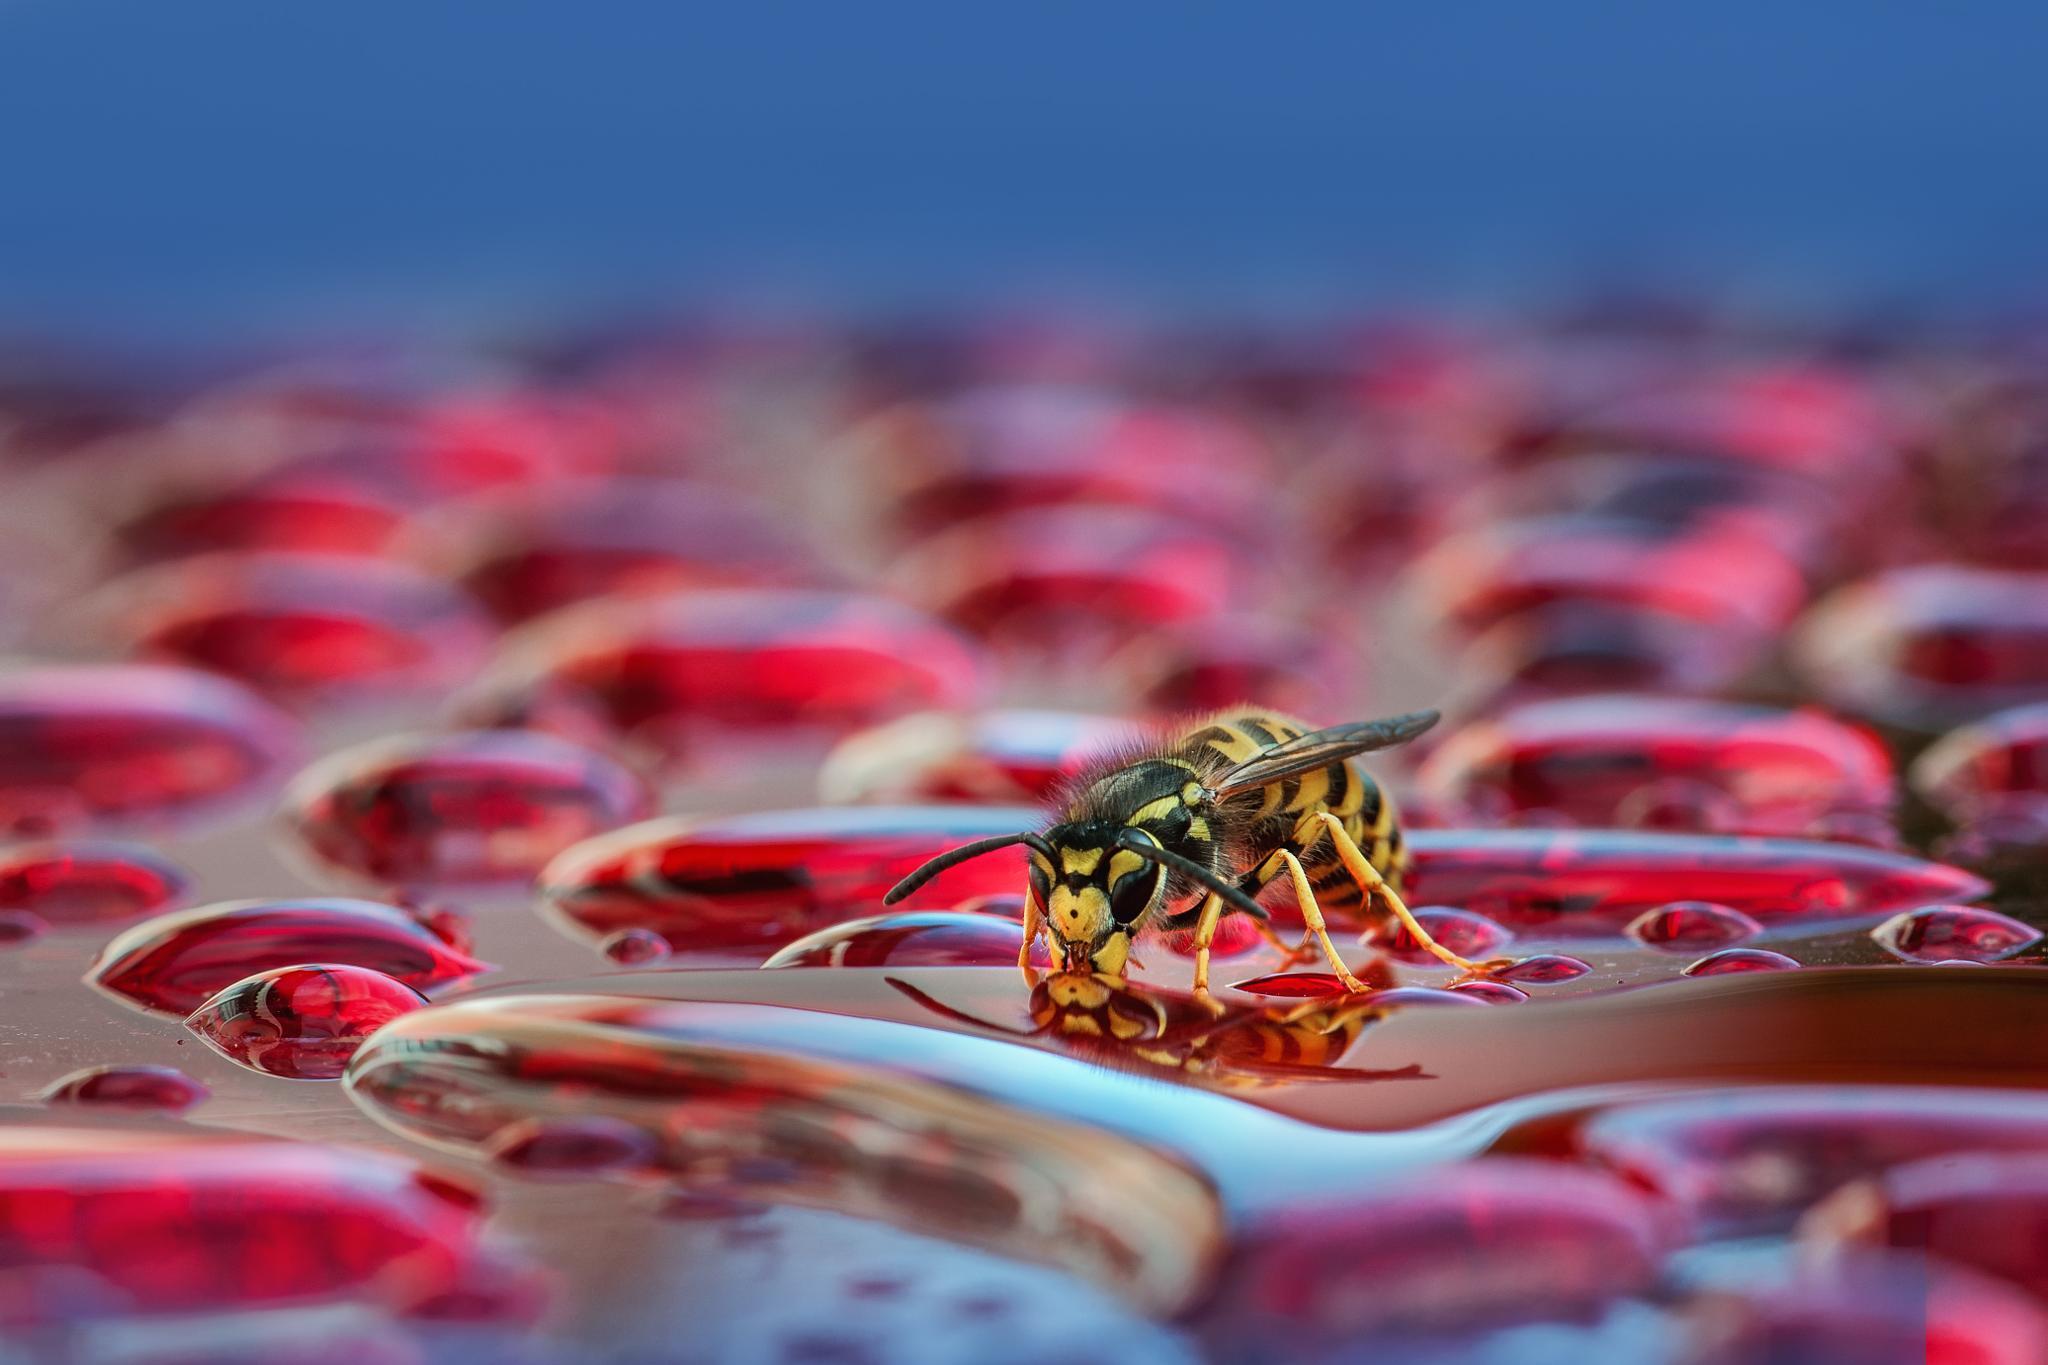 A sea of drops by Wolfgang Korazija